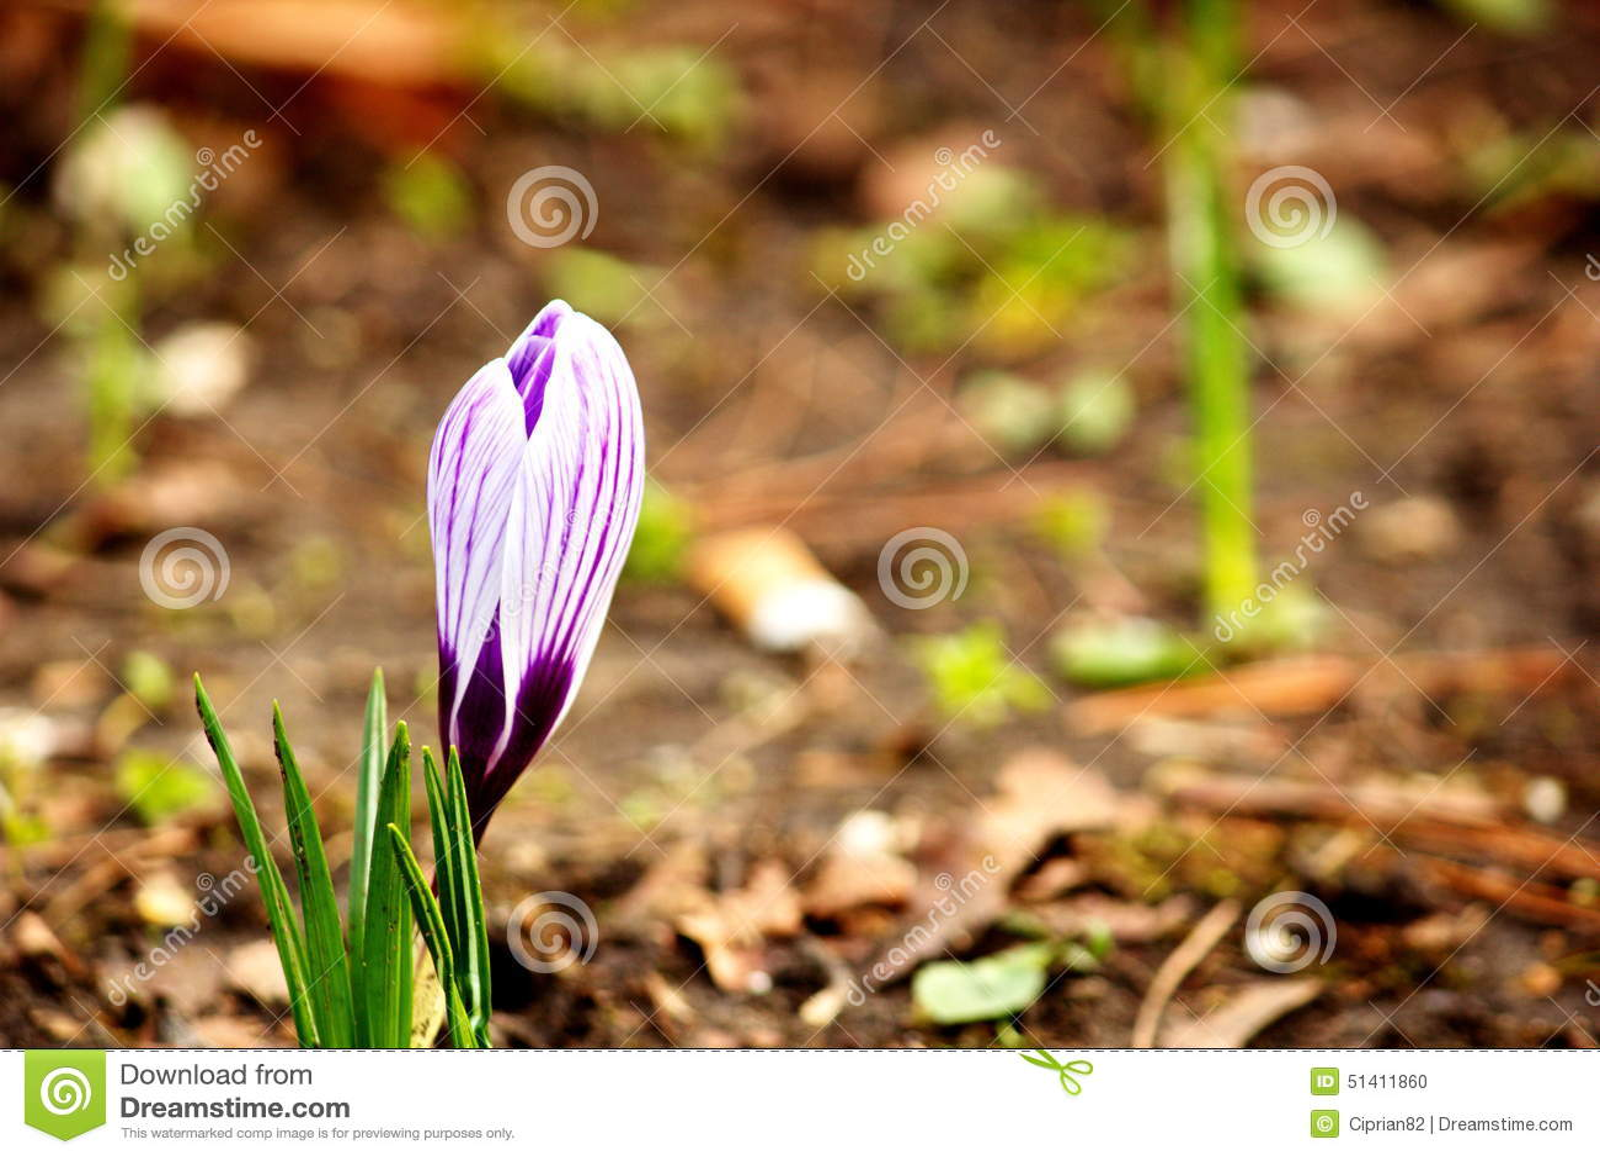 Beautiful single flower blooming near to a cigarette stump stock download beautiful single flower blooming near to a cigarette stump stock photo image of bloom izmirmasajfo